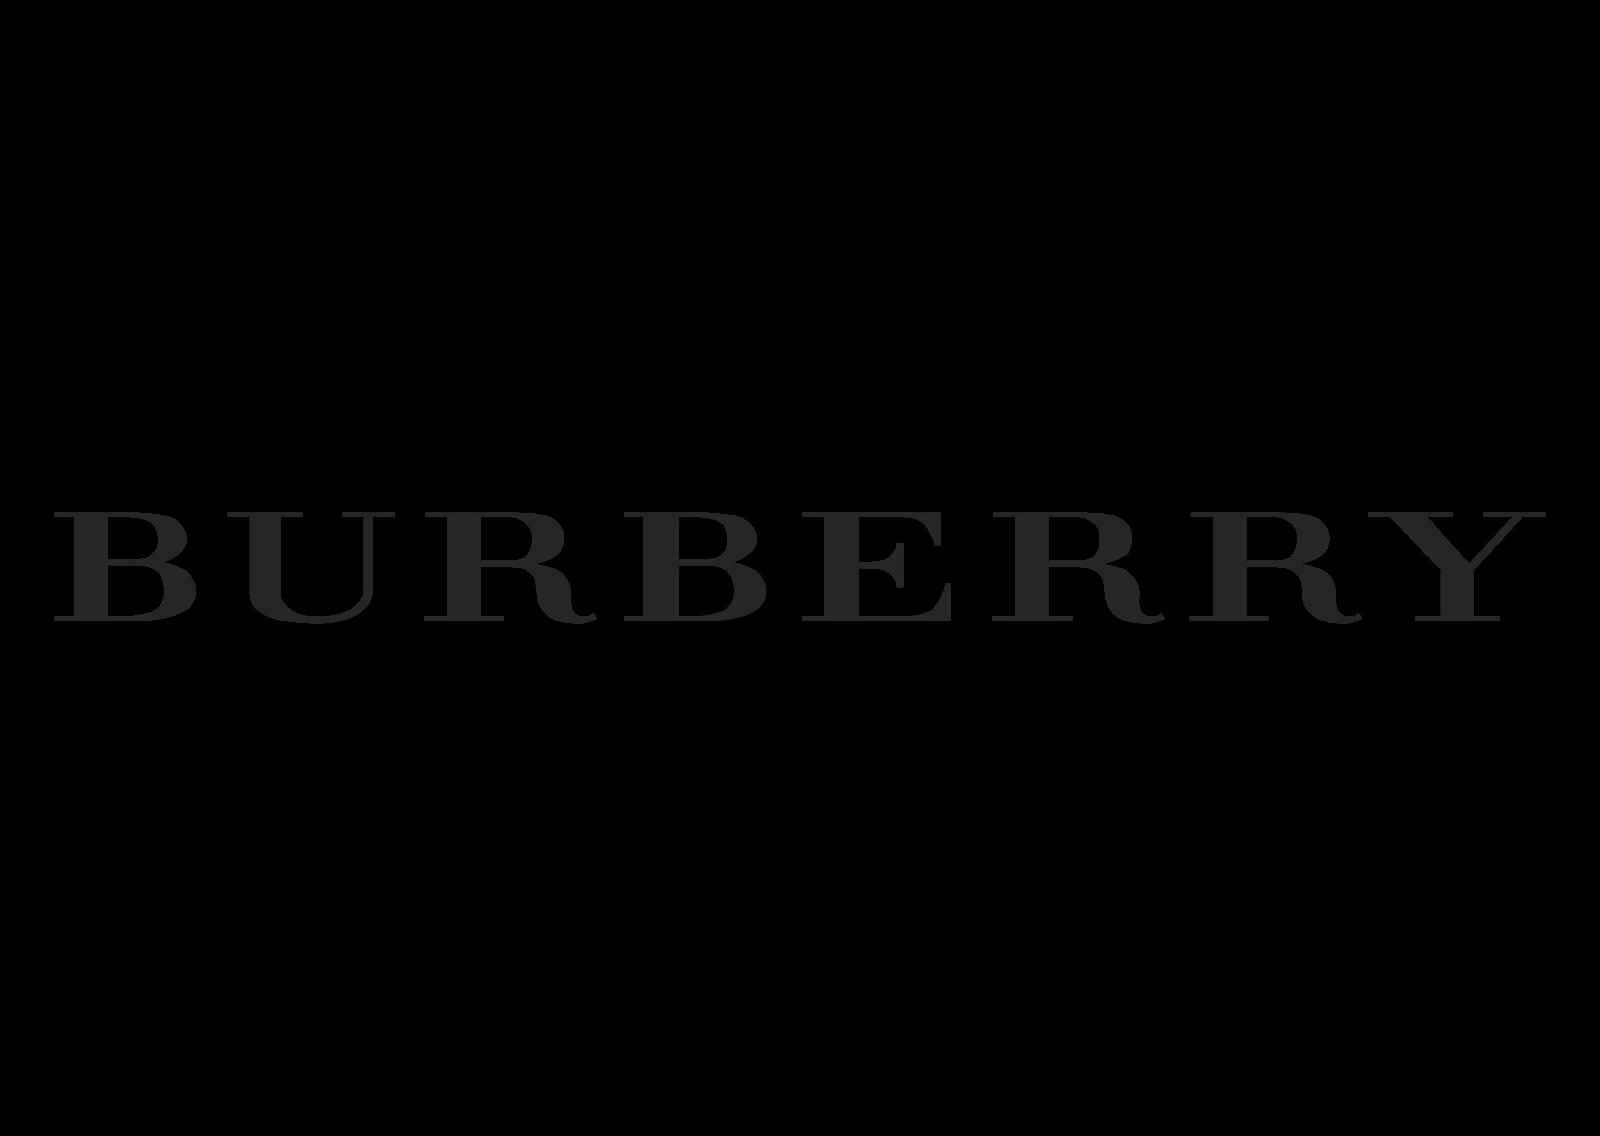 Burberry-vector-logo-Design-part-2.png